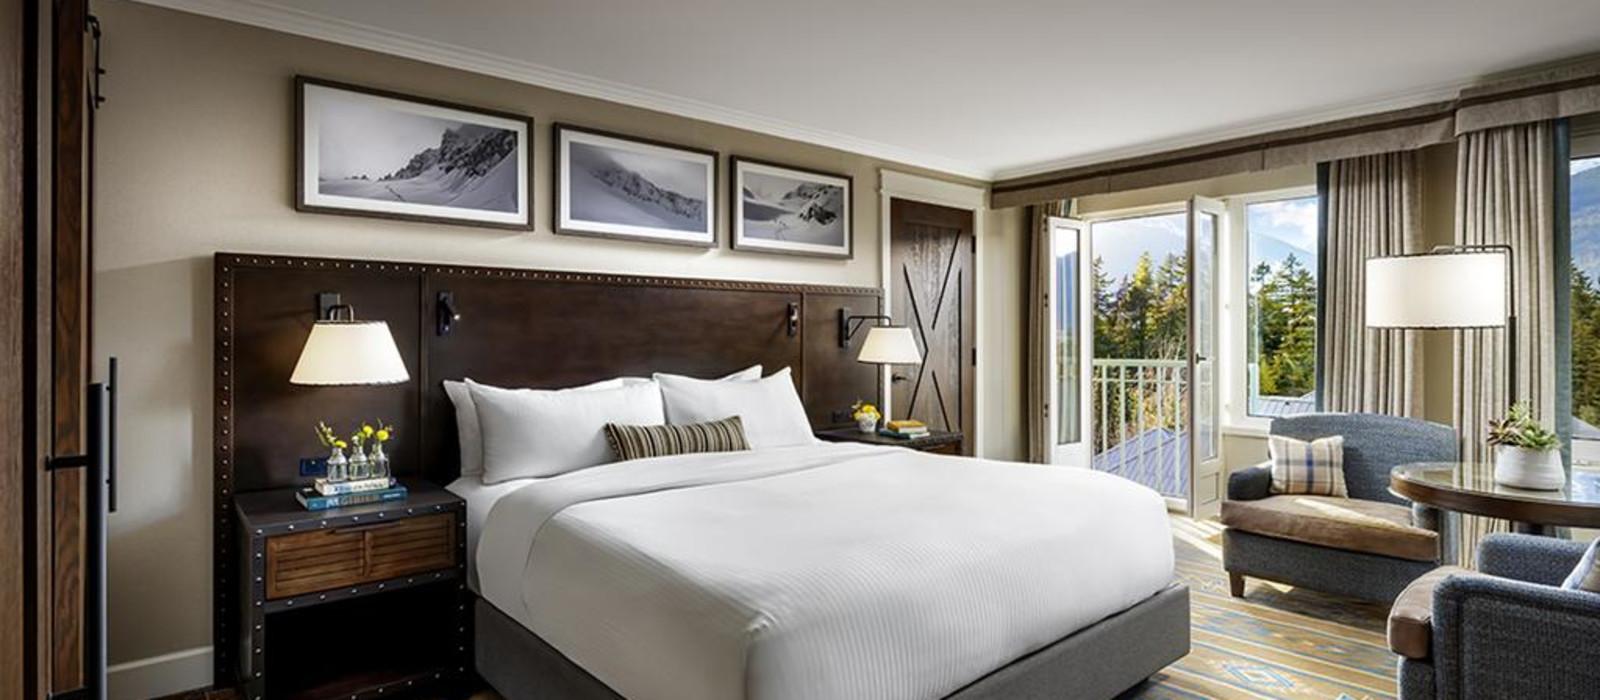 Hotel Fairmont Chateau Whistler Canada